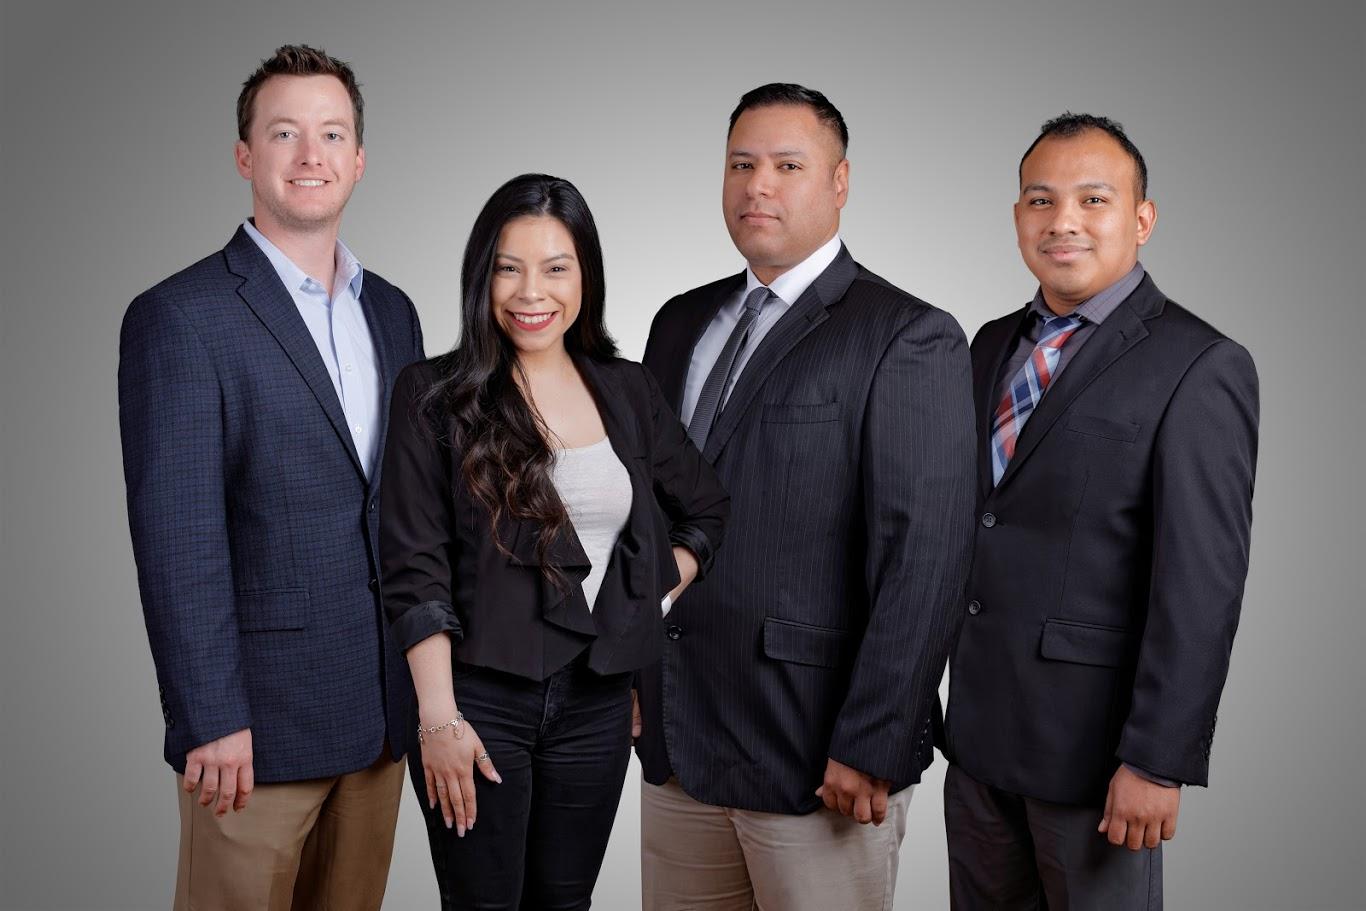 Clint Hibbard: Allstate Insurance